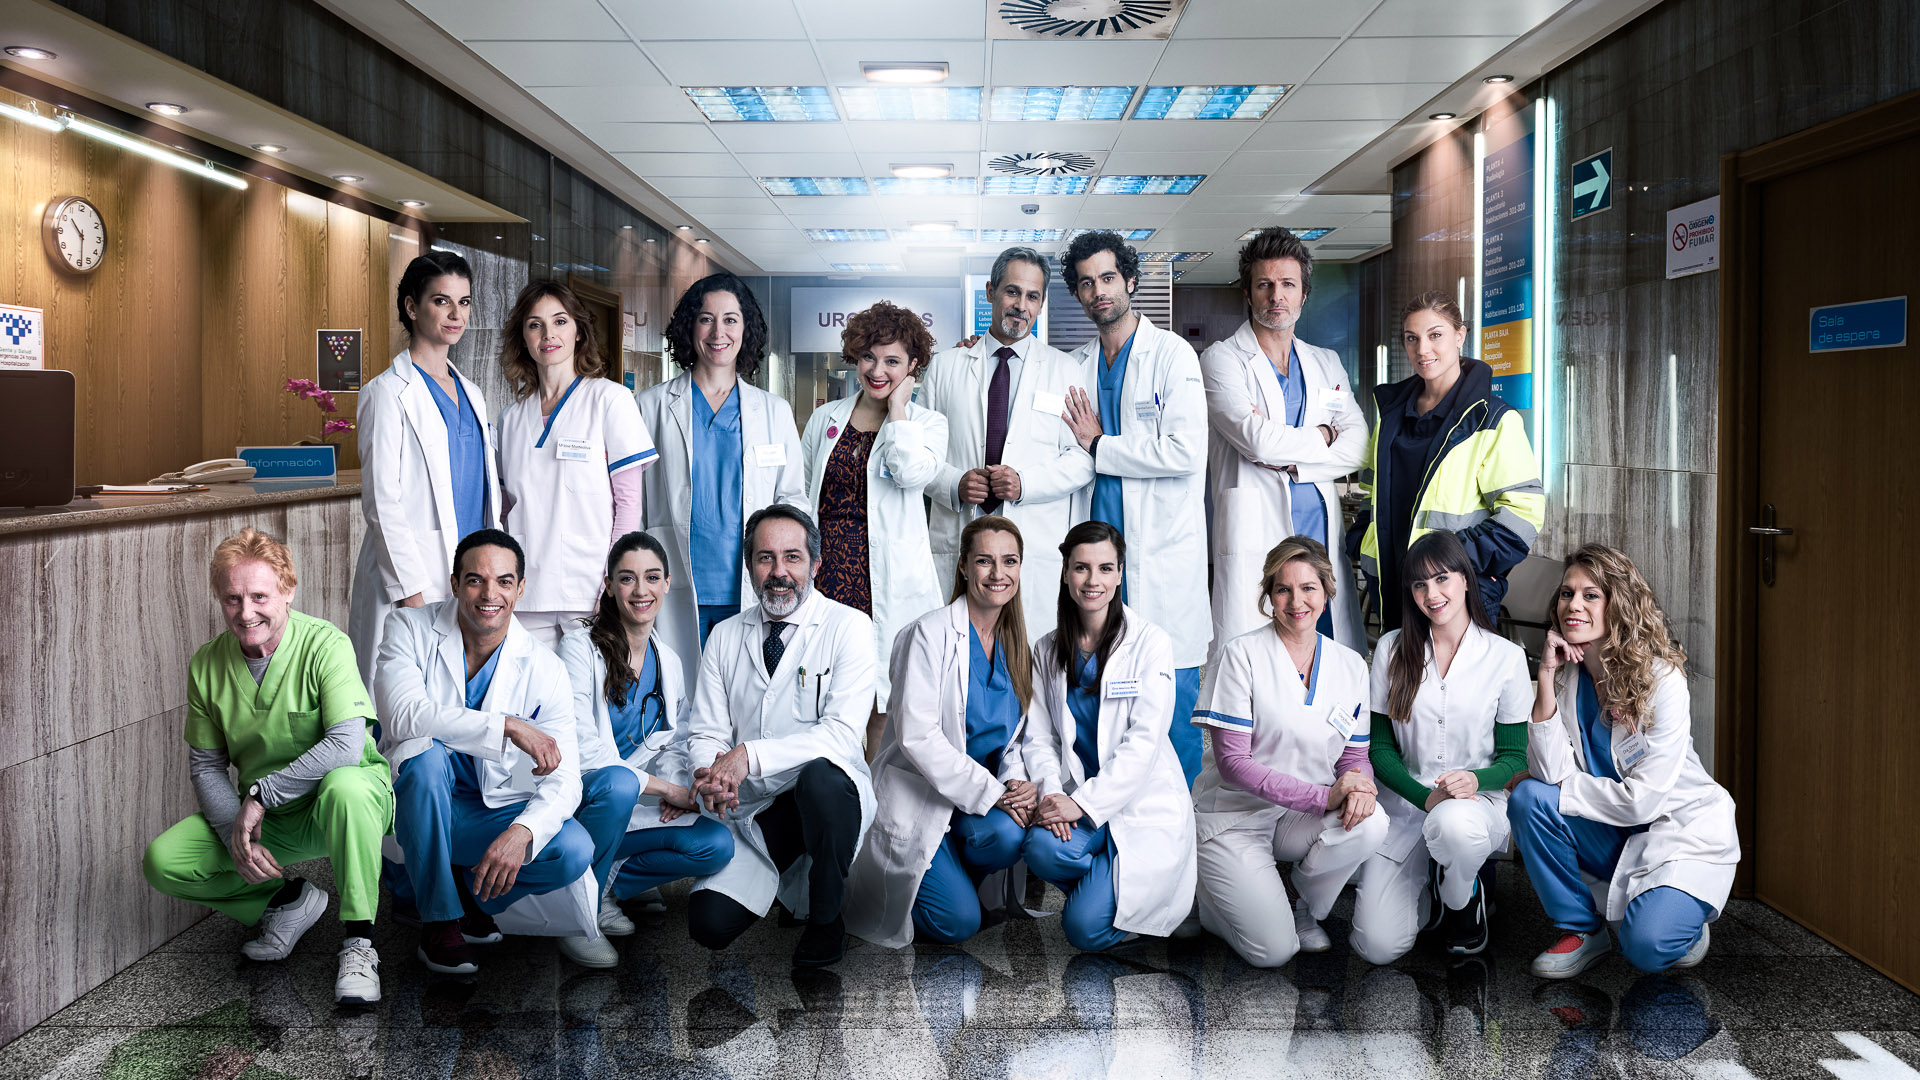 Centro medico grupo.jpg